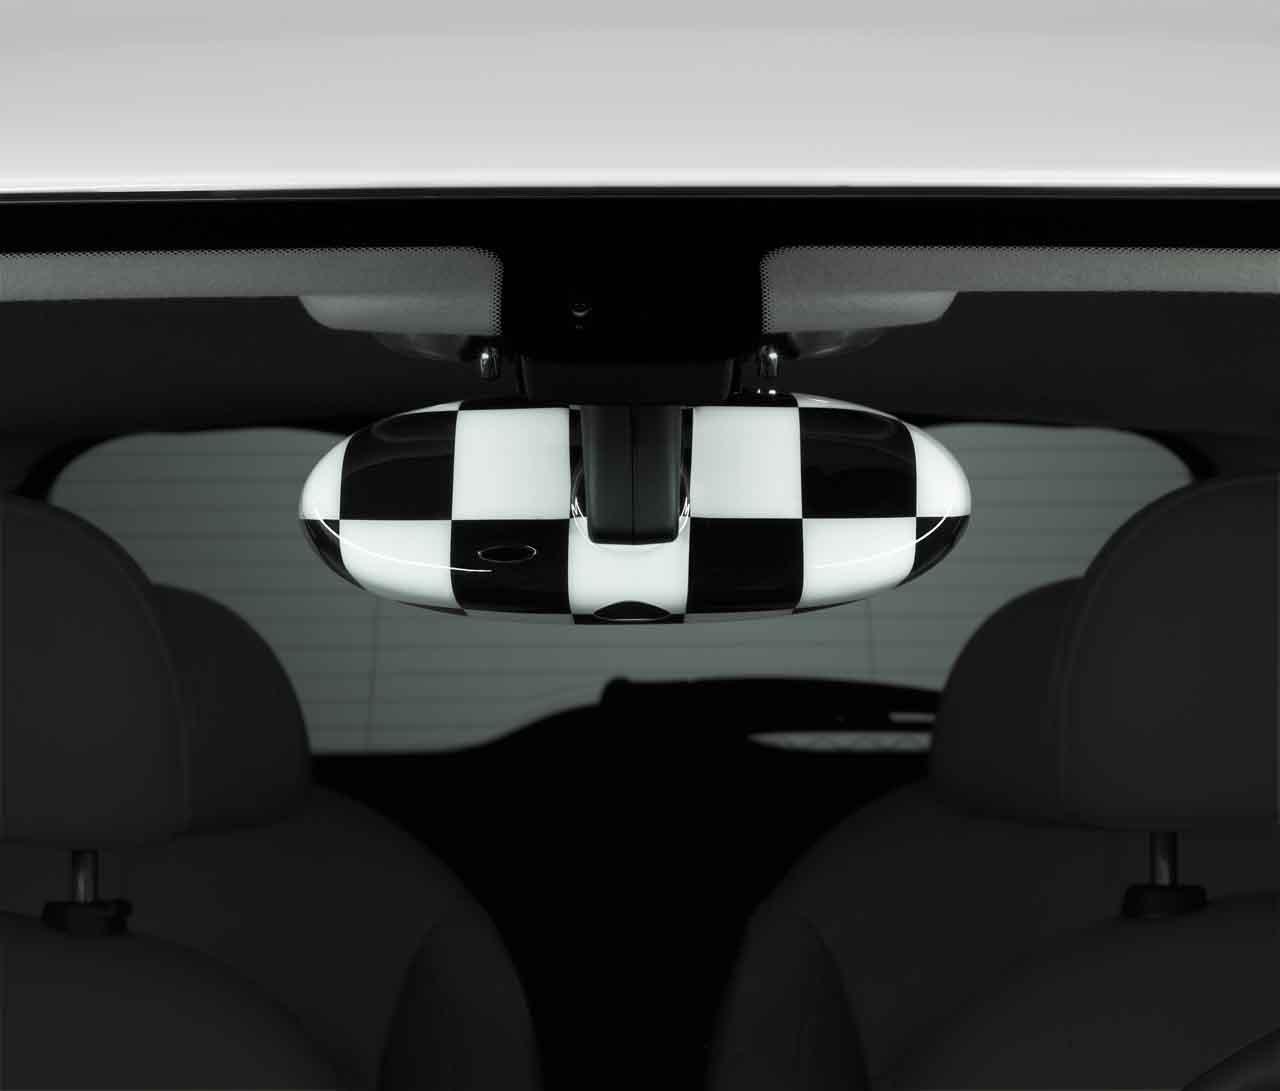 Mini echt Innen Rear View Mirror Cover Cap kariert Flagge 82252336854